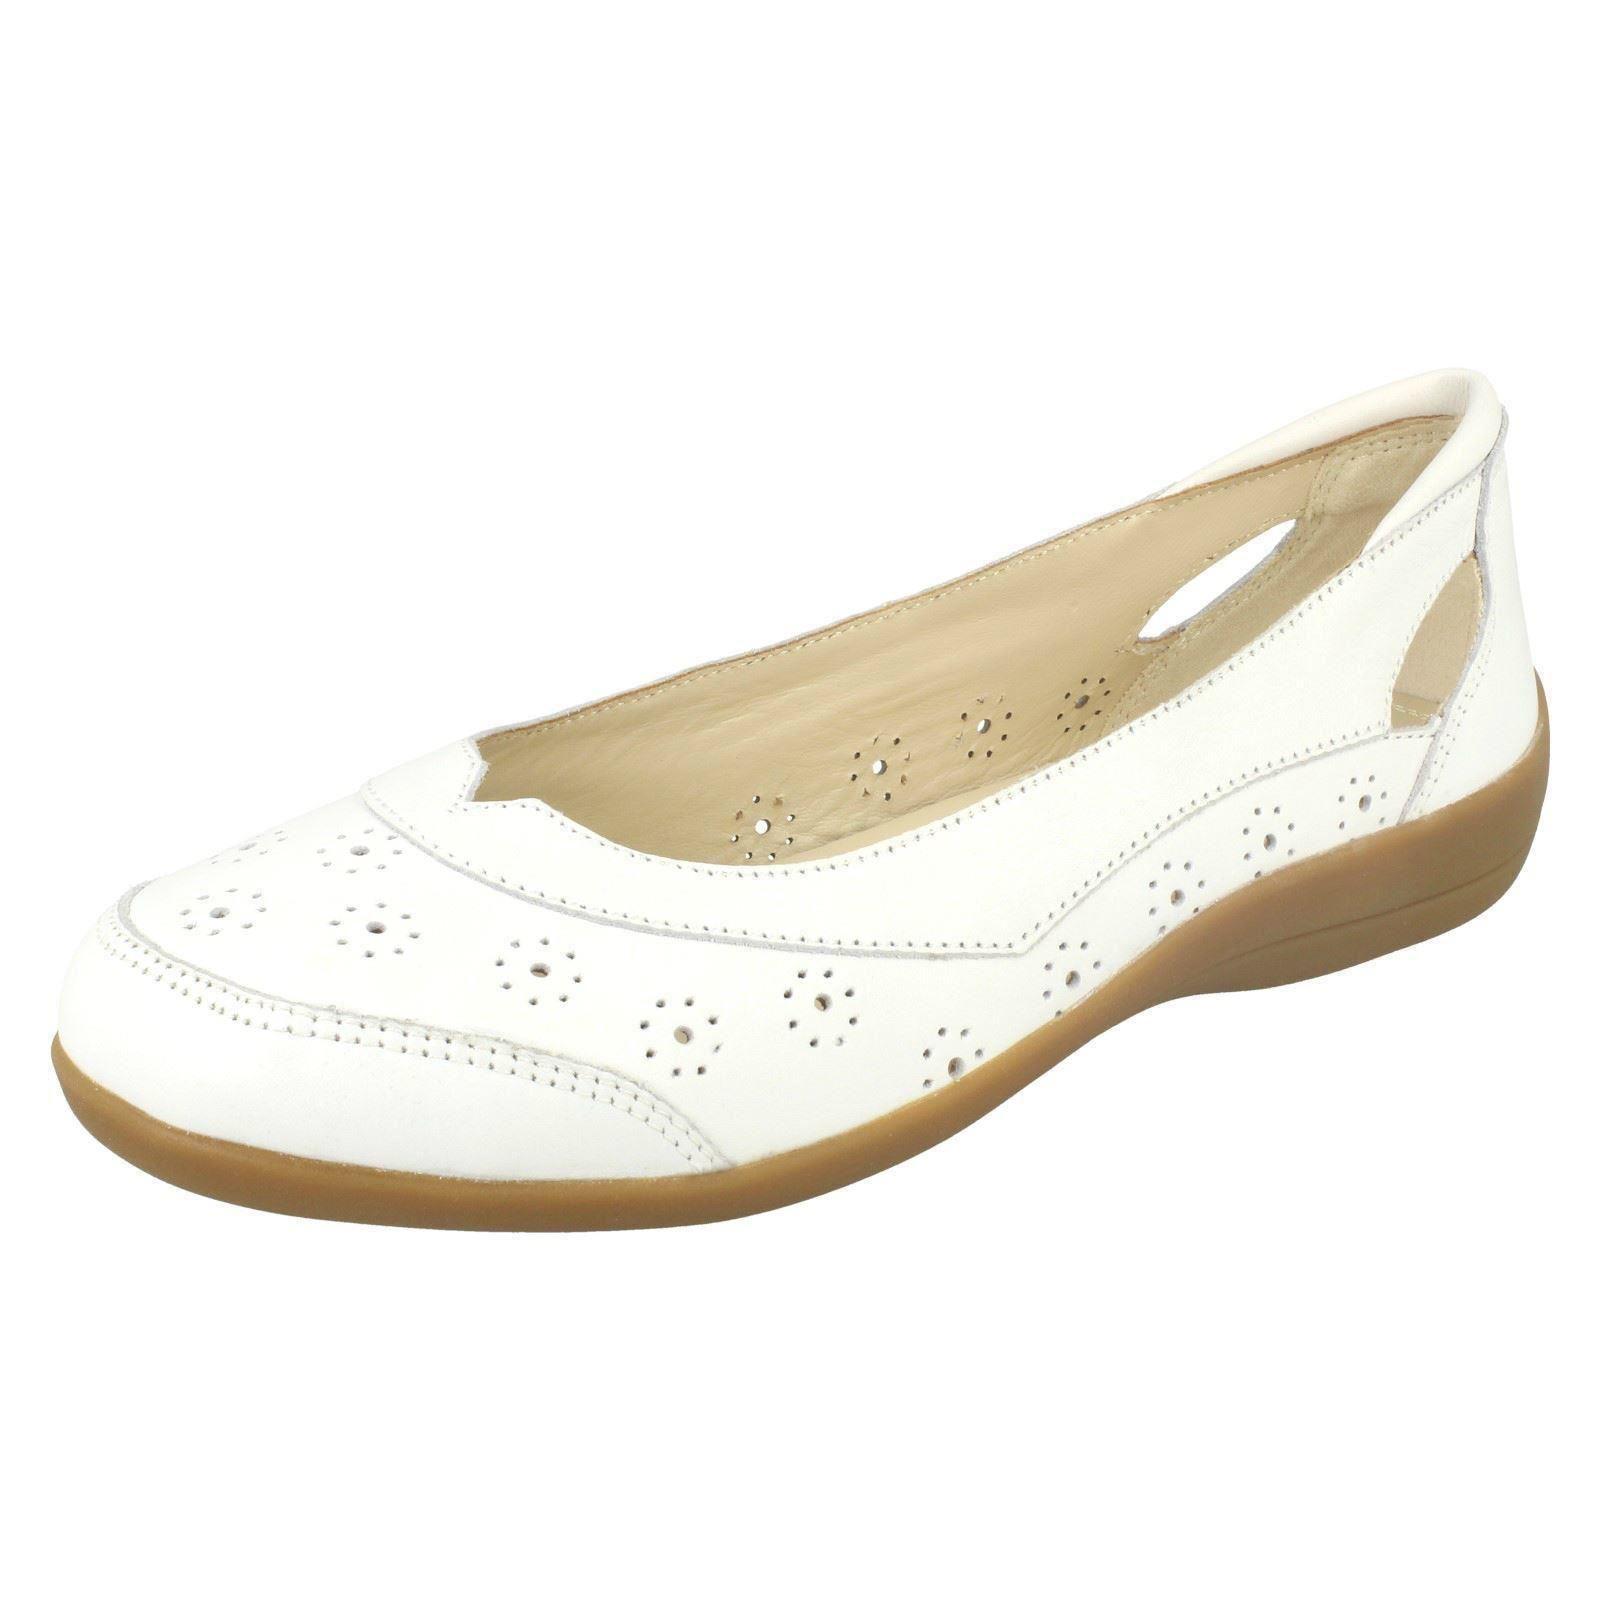 Mujer Padders Corte Ancho Plano Zapatos de Cuero Semi Semi Semi  comprar ahora